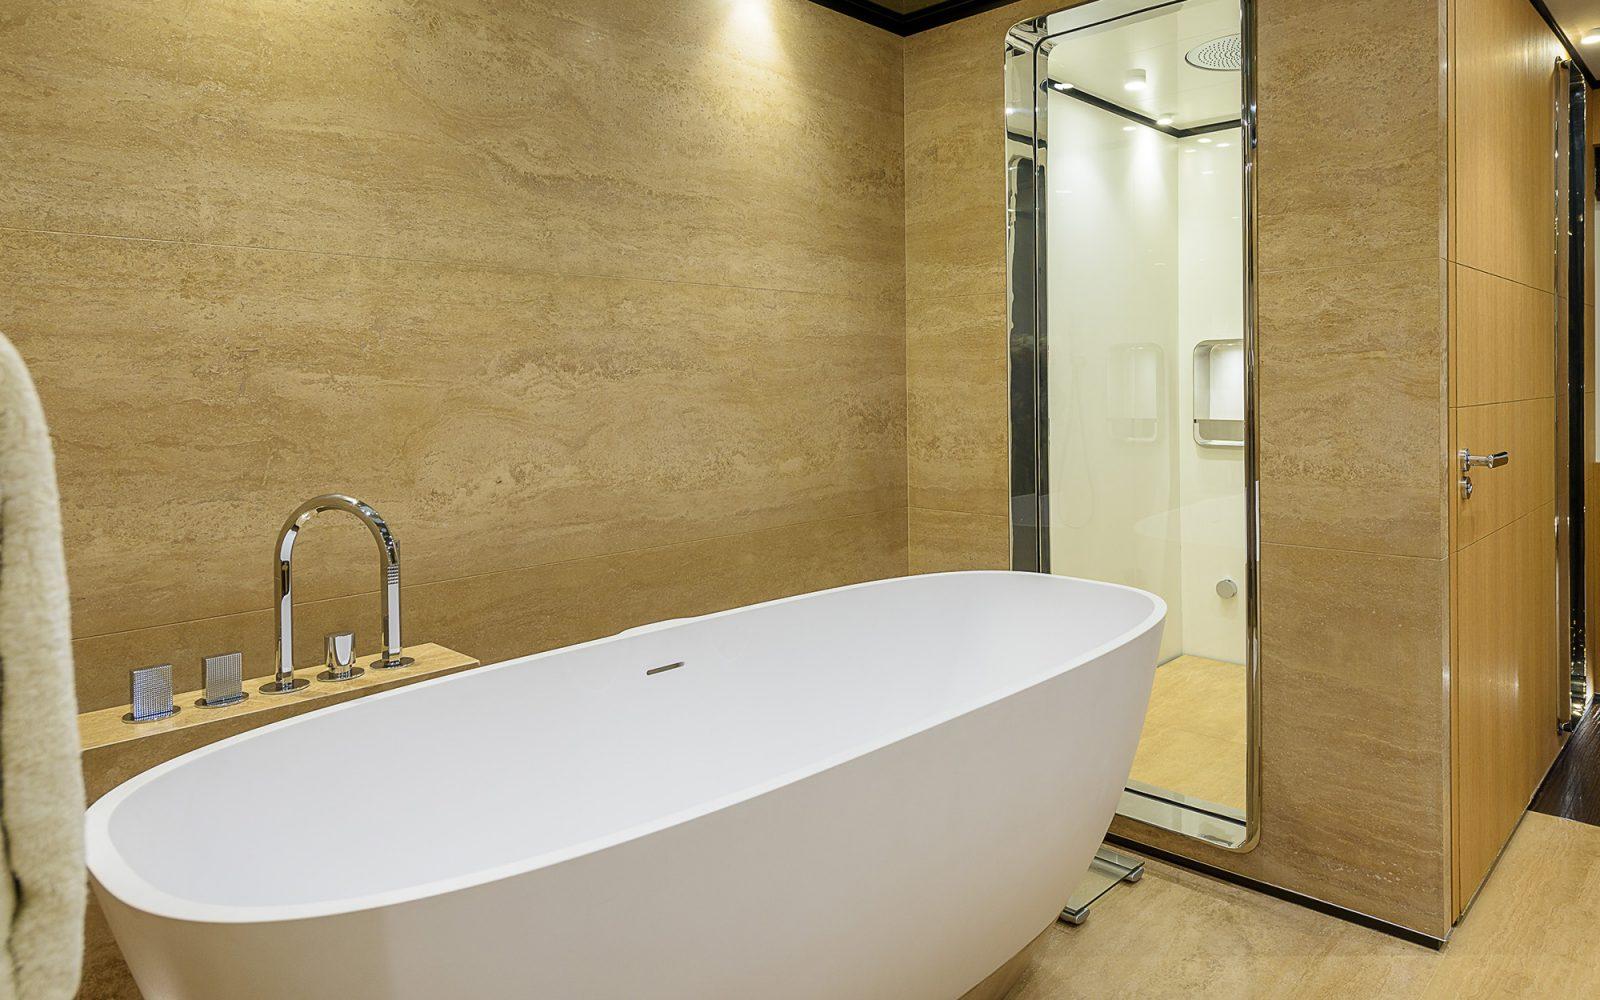 MR. T master bath tub | Mr. T